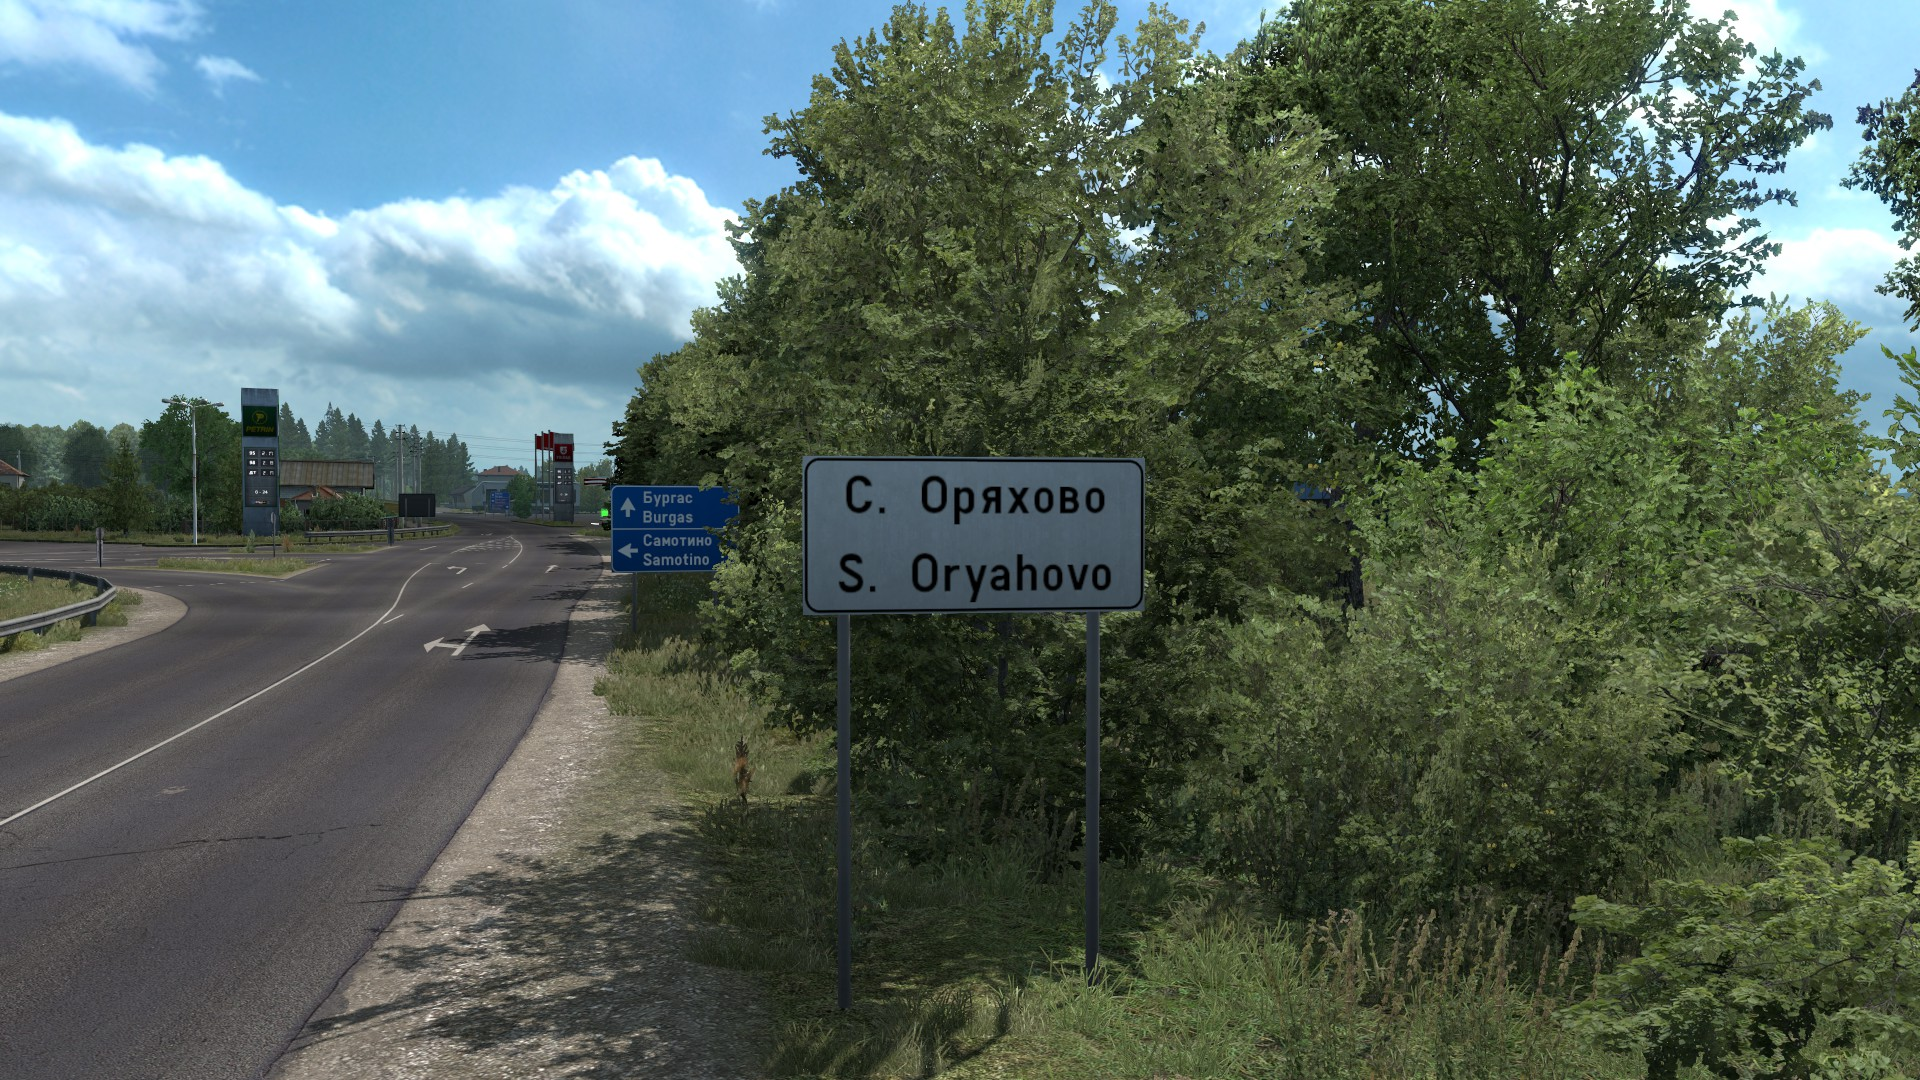 Staro Oryahovo